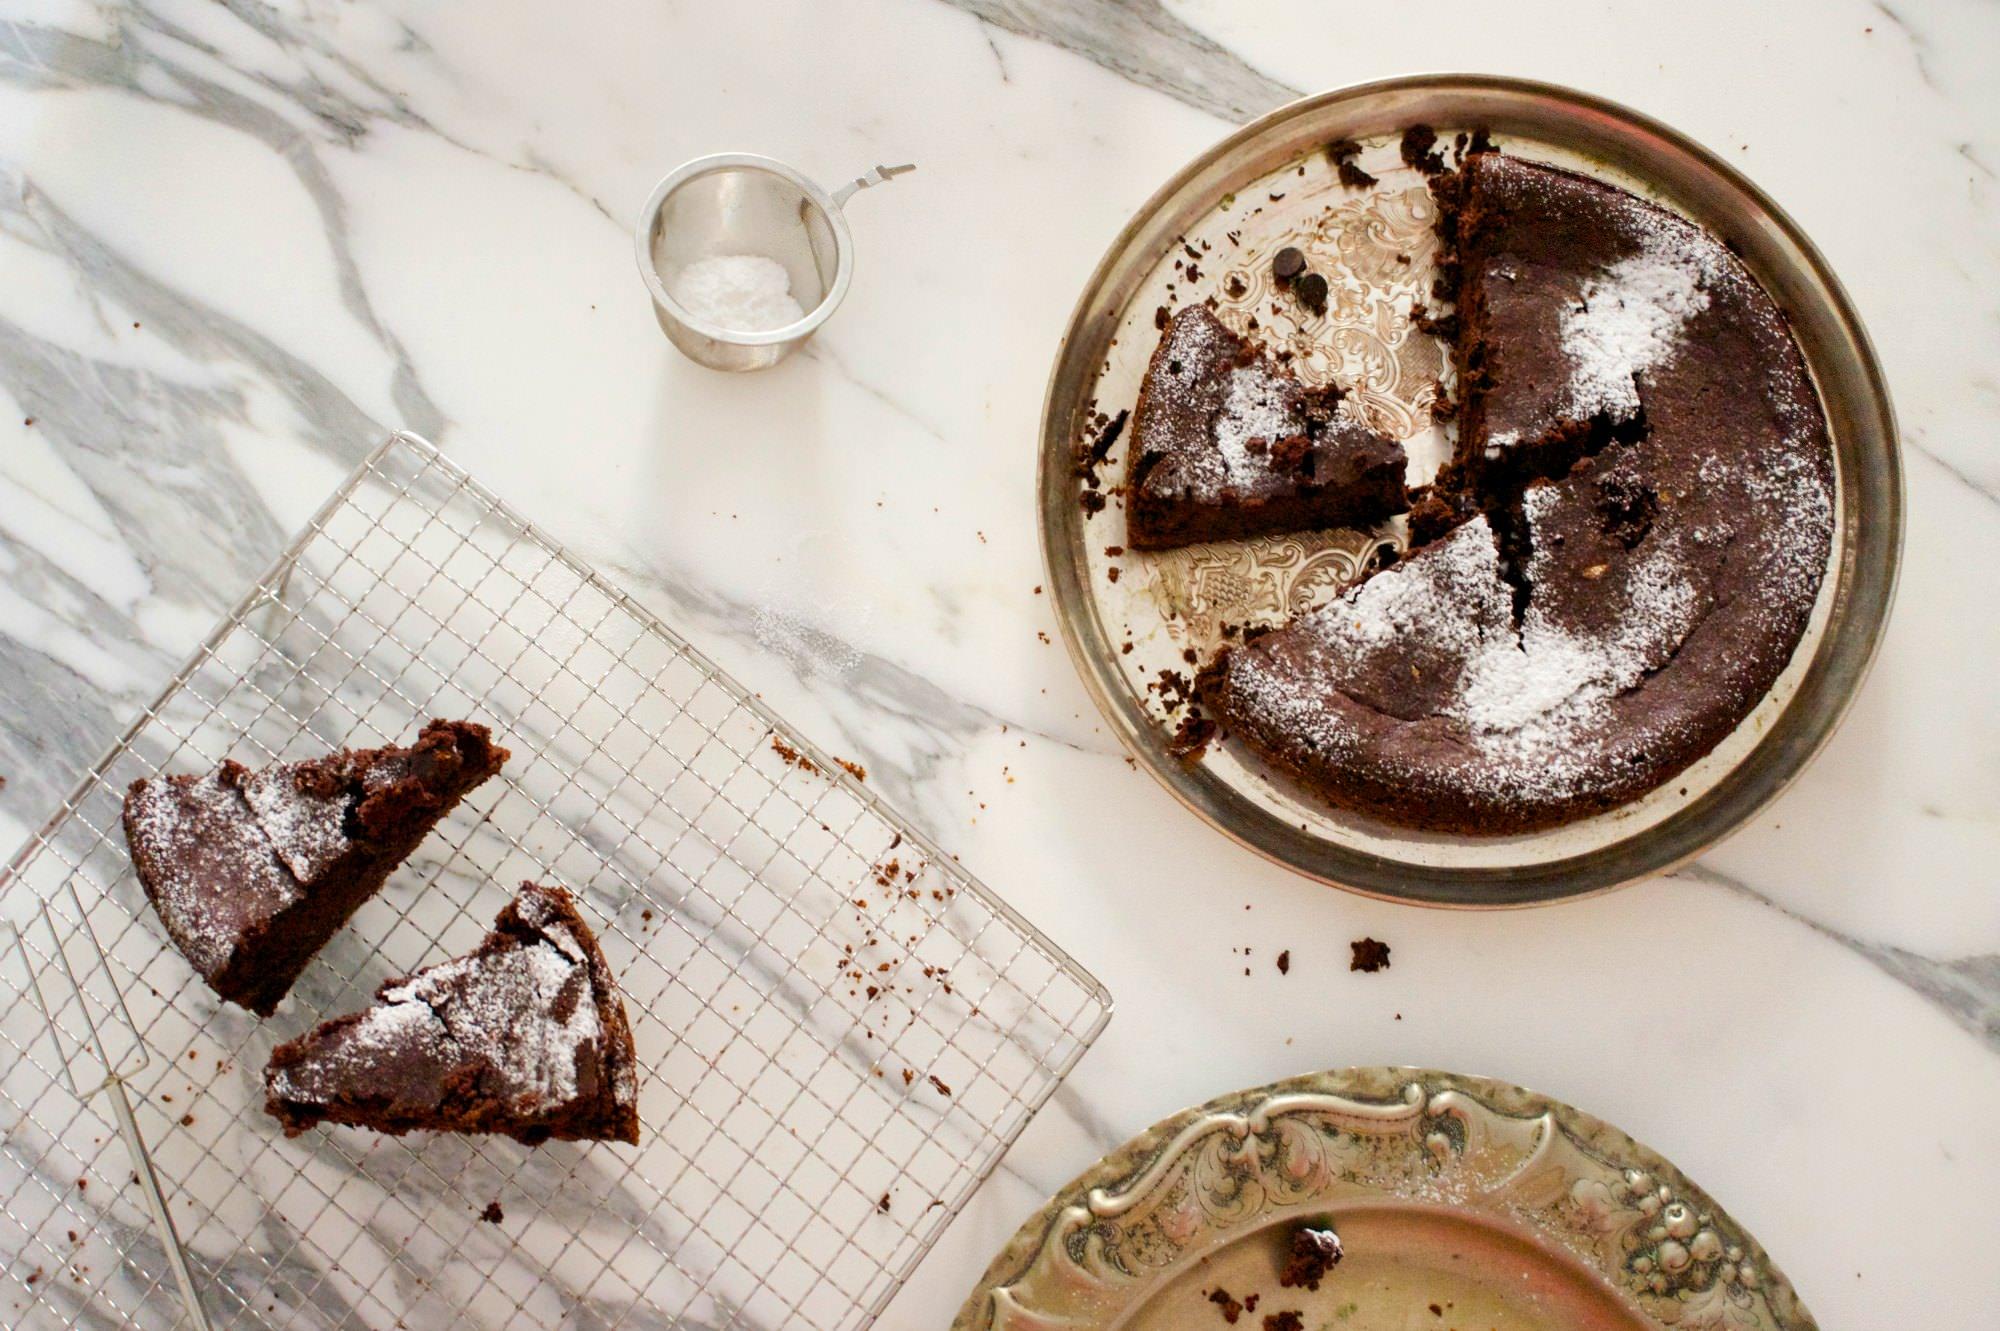 cheesecake con cioccolato dolcevita